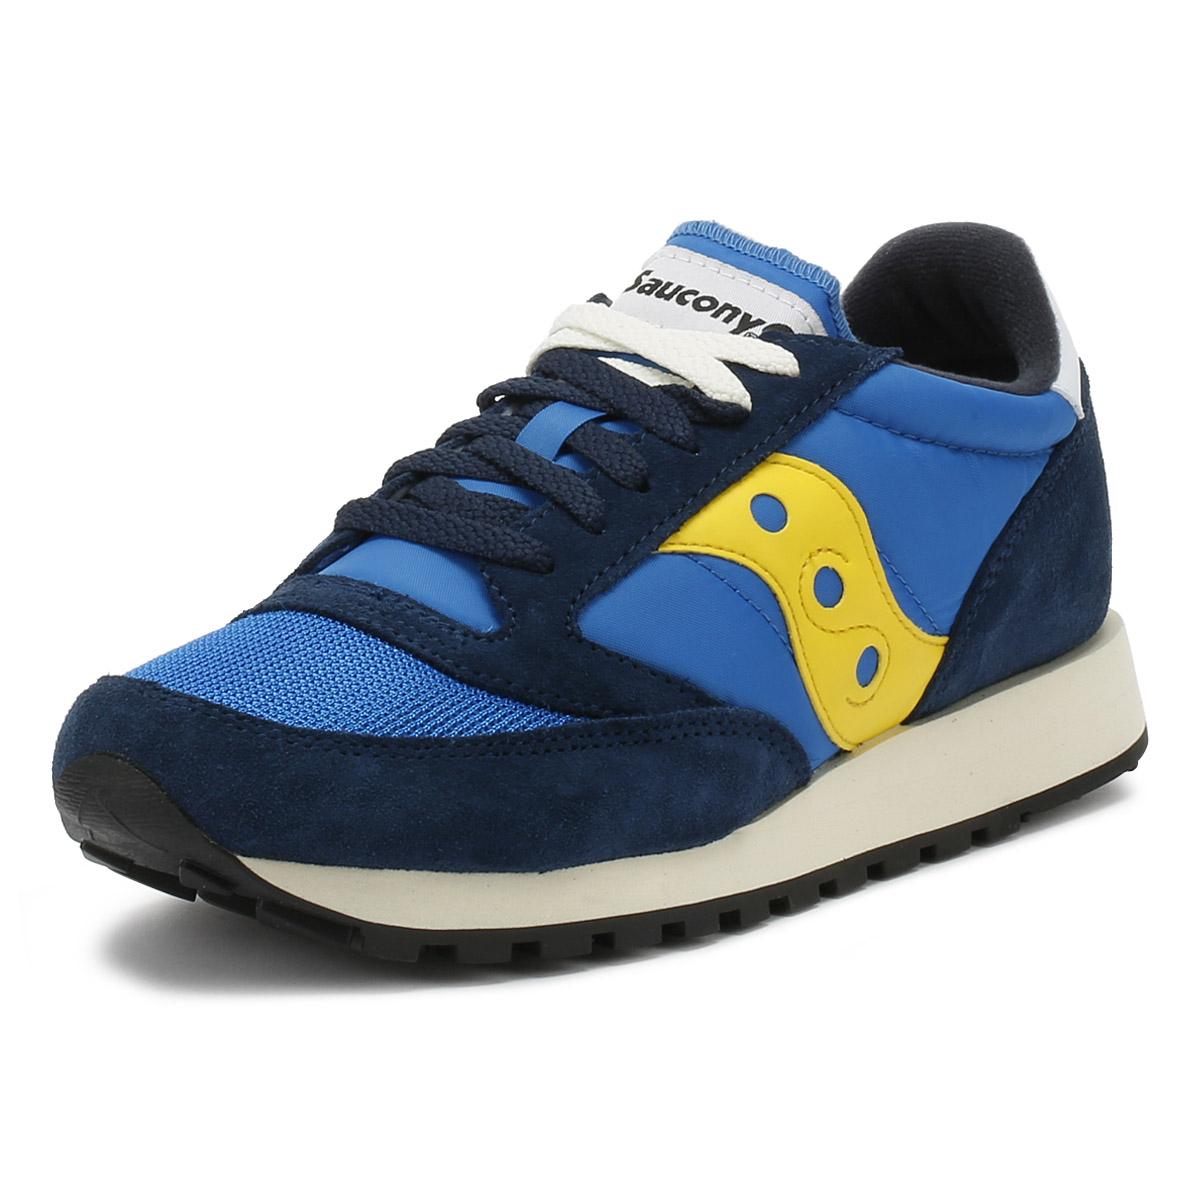 33576237 Details about Saucony Mens Trainers Blue & Yellow Jazz Original Vintage  Sport Casual Shoes